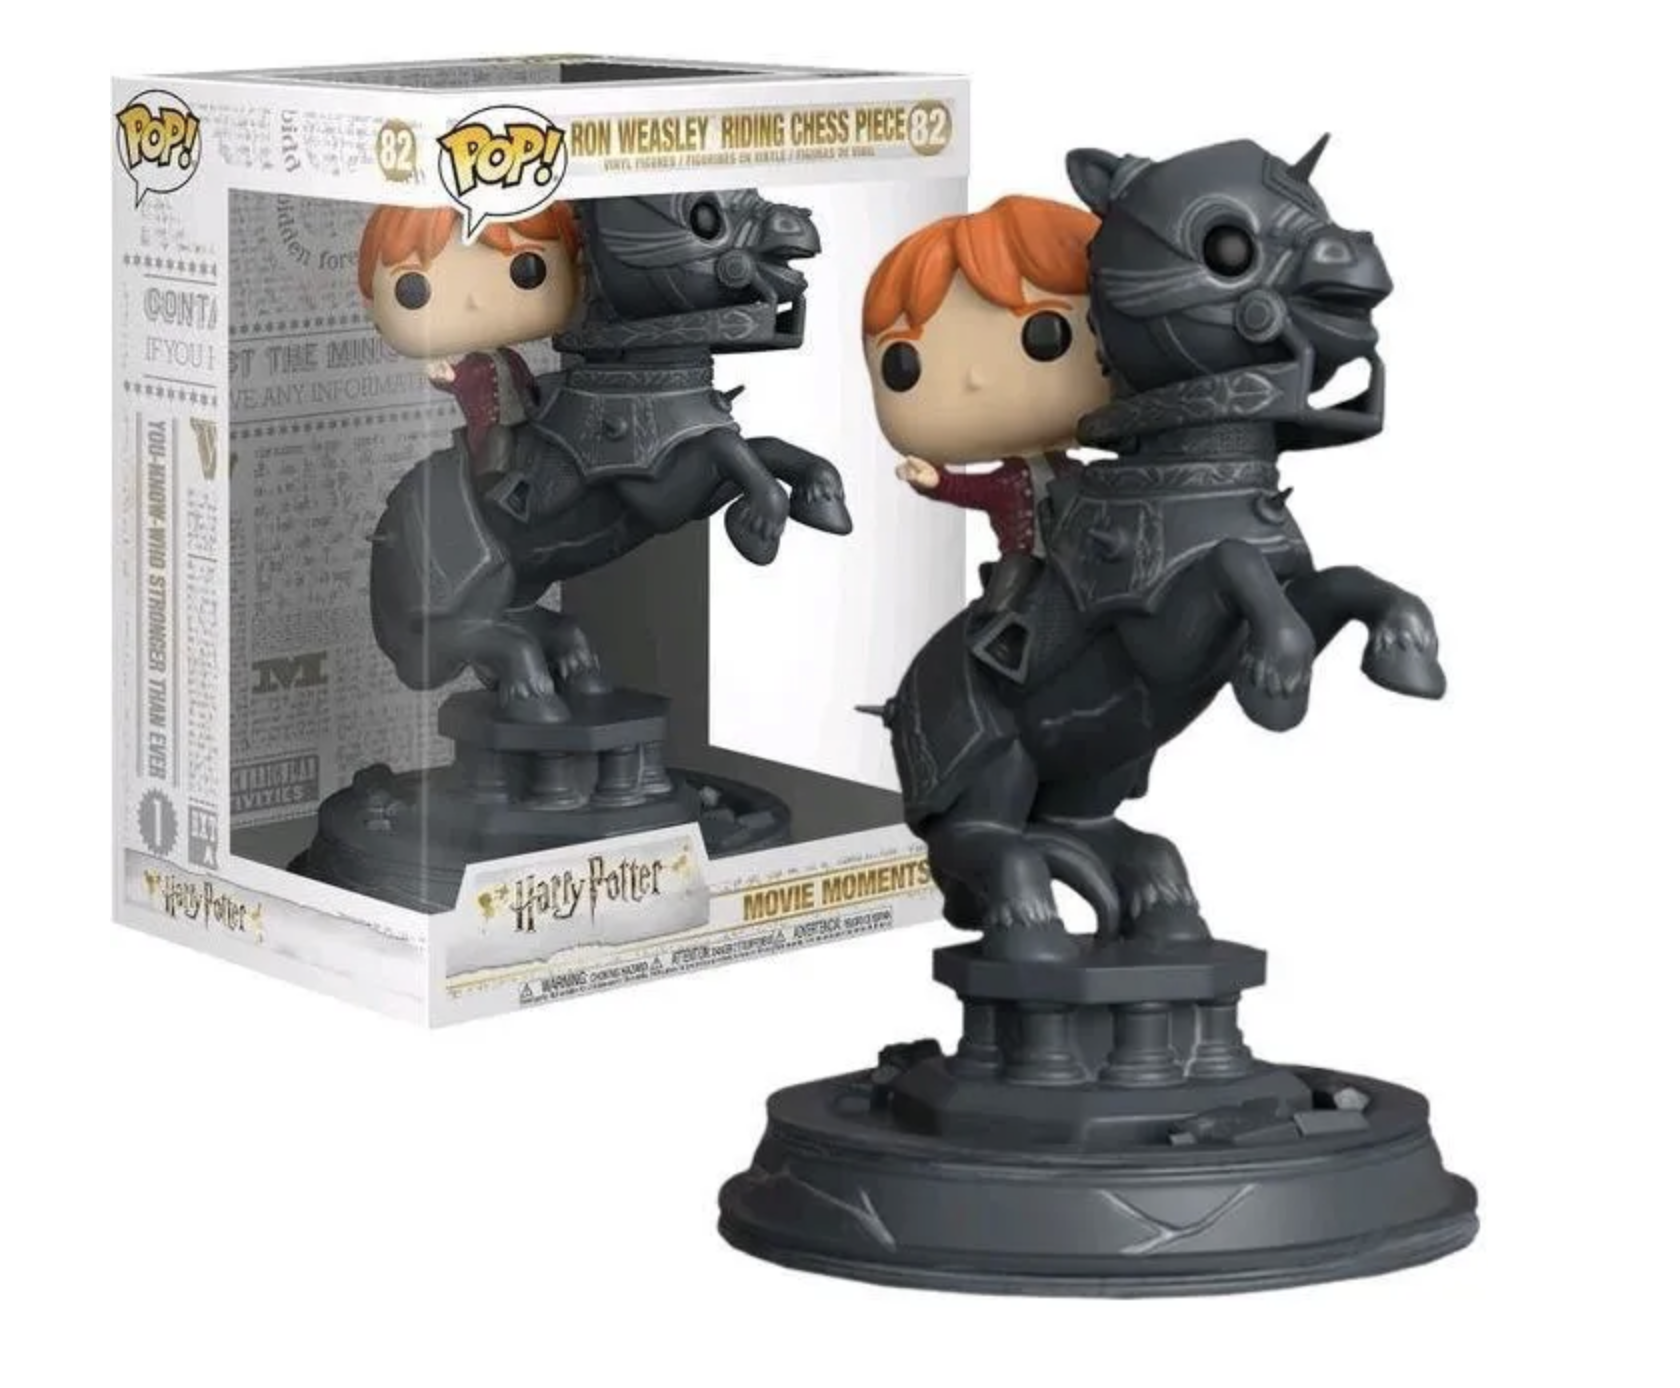 Harry Potter - Bobble Head Funko Pop N°82 : Ron Riding Chess Piece